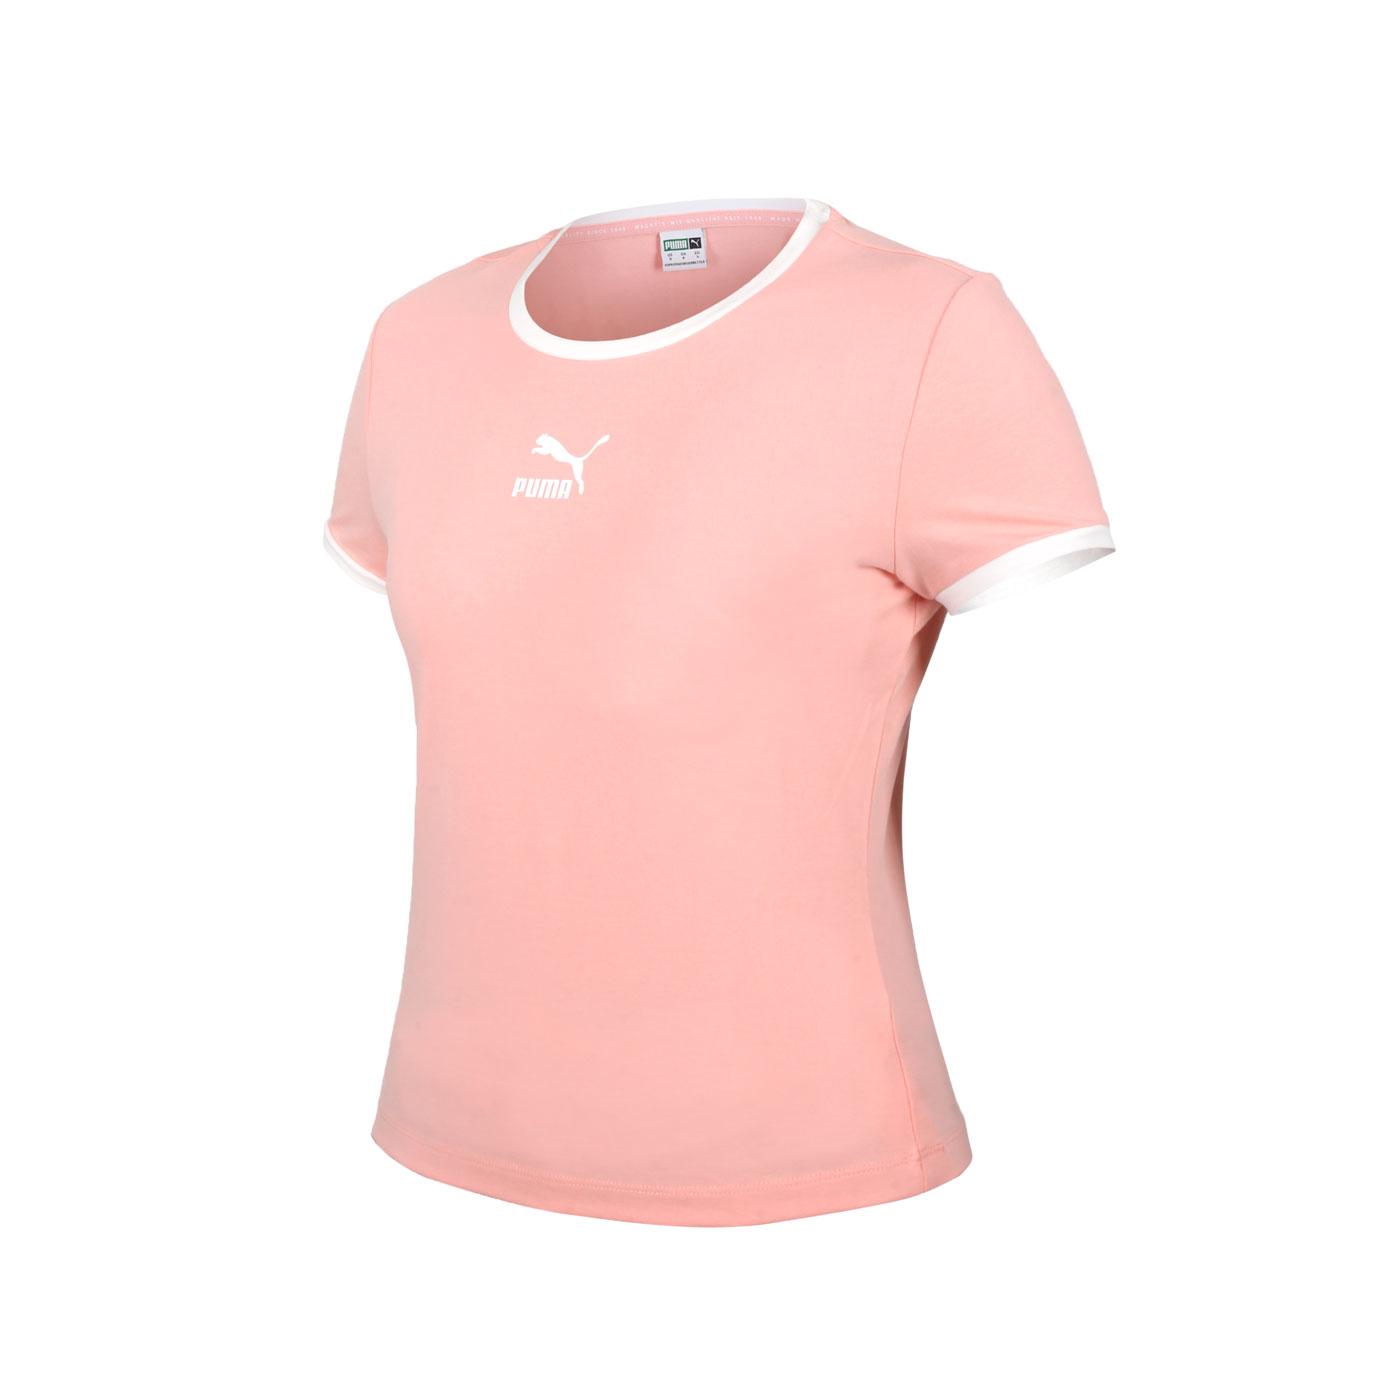 PUMA 女款貼身短袖T恤 59957726 - 粉橘白